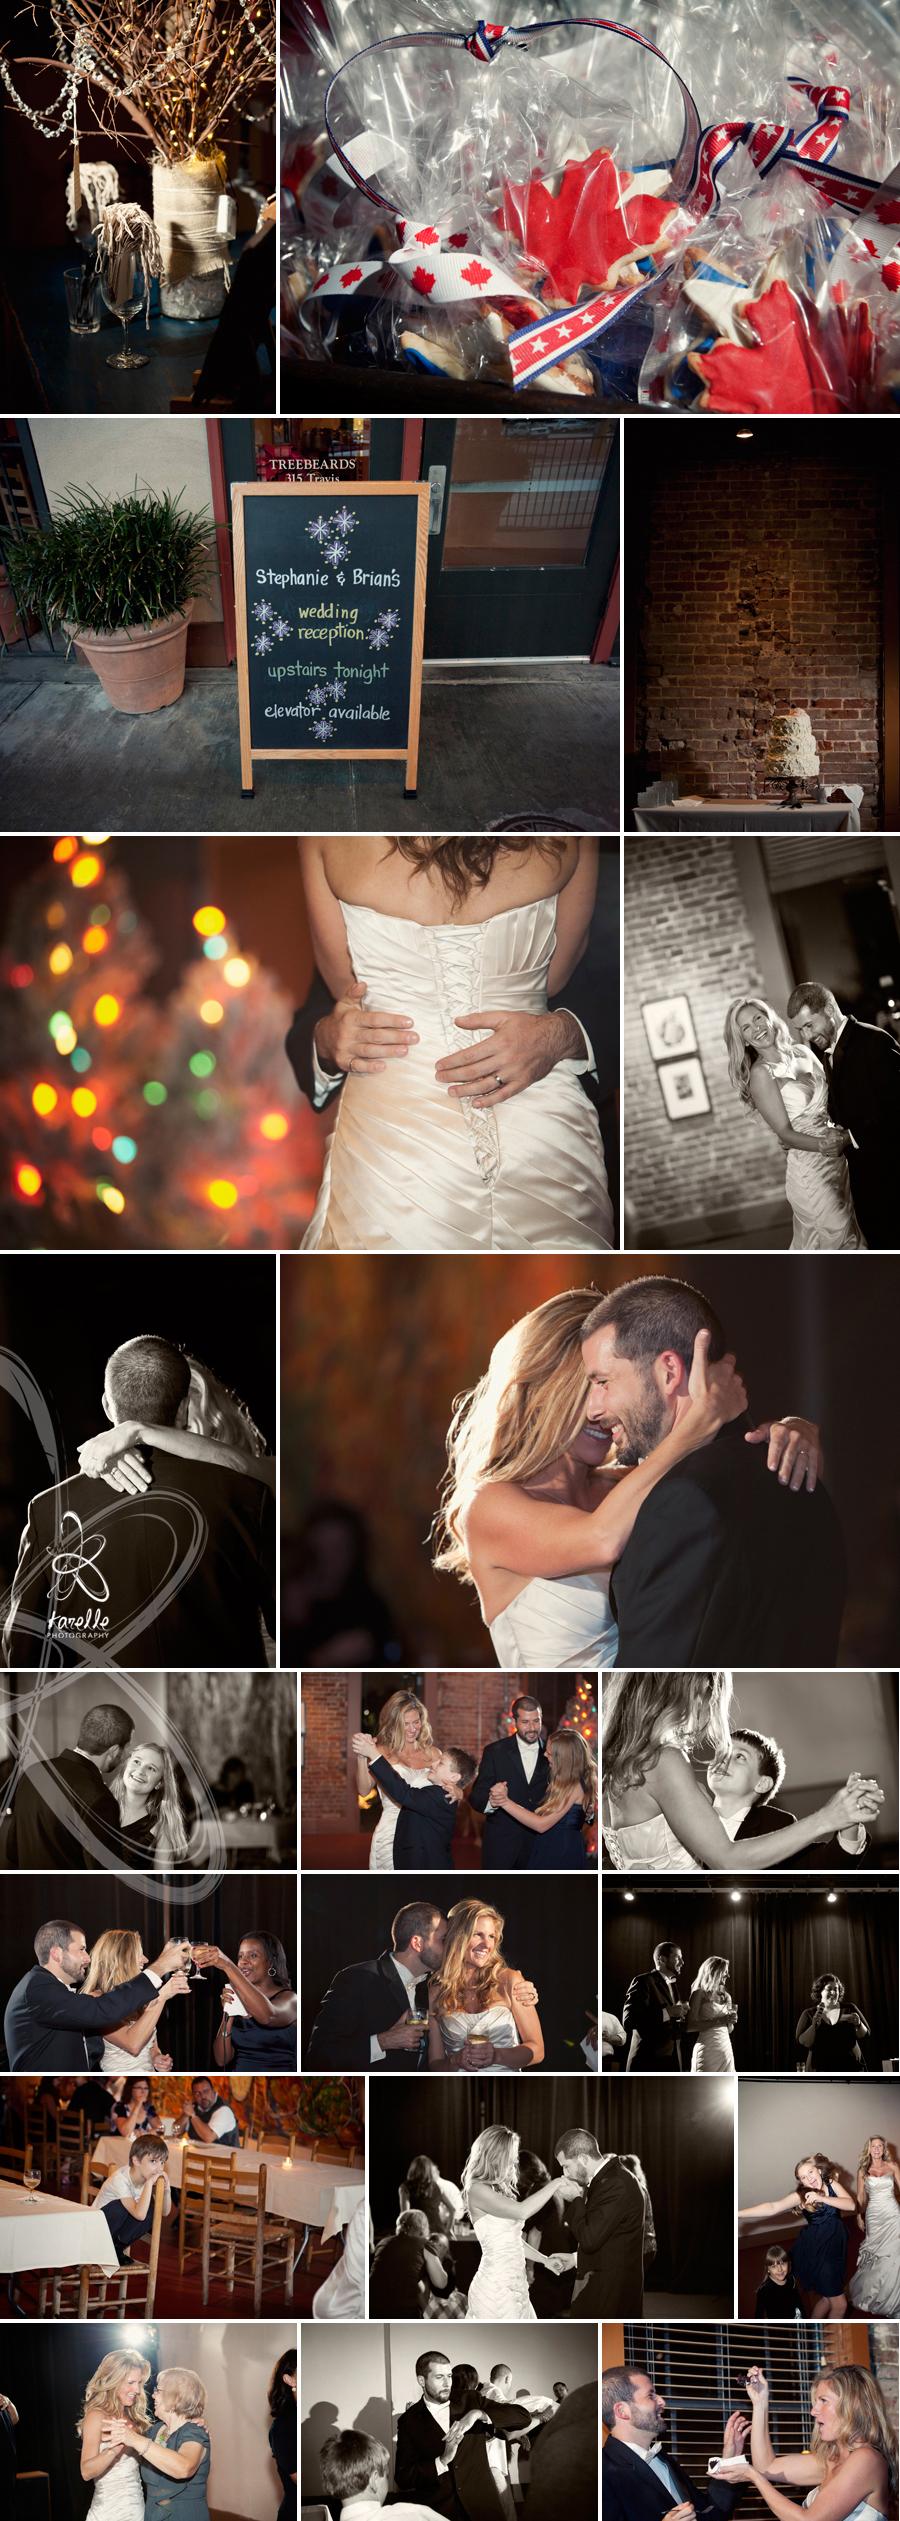 Stephanie and Brian's wedding day, reception